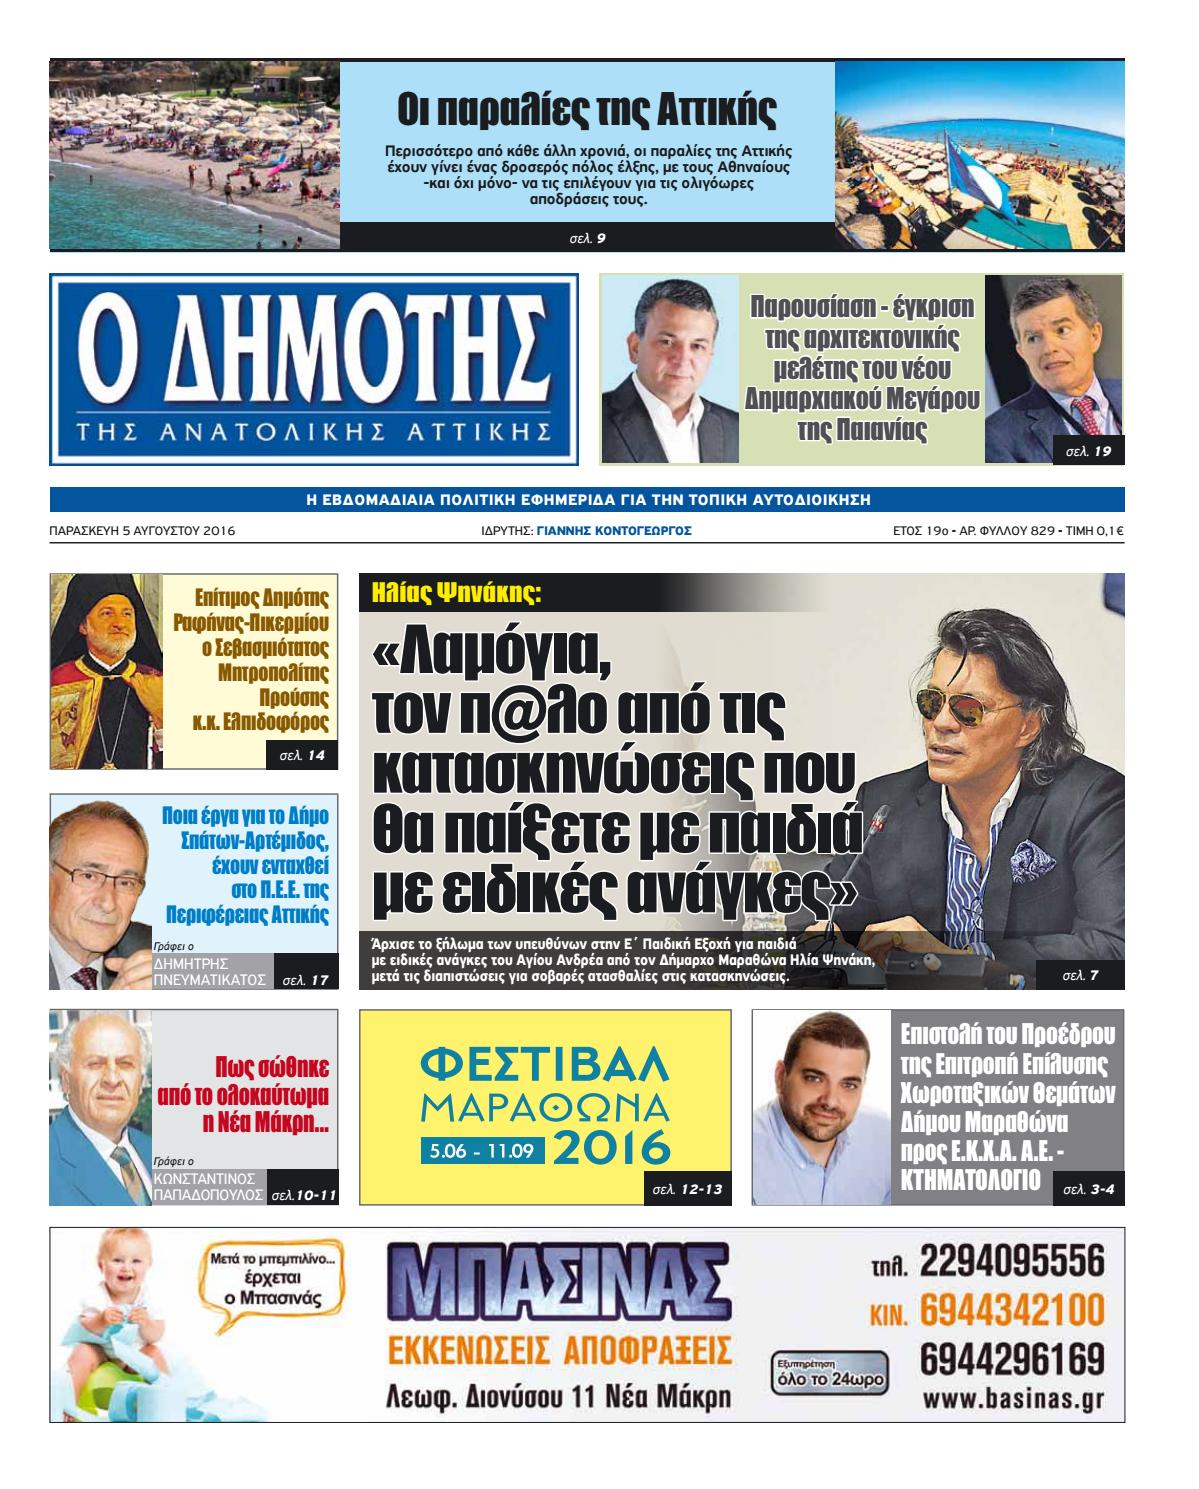 40723322e981 Dhm 829 5 8 2016 by dhmoths anatolikis attikis - issuu